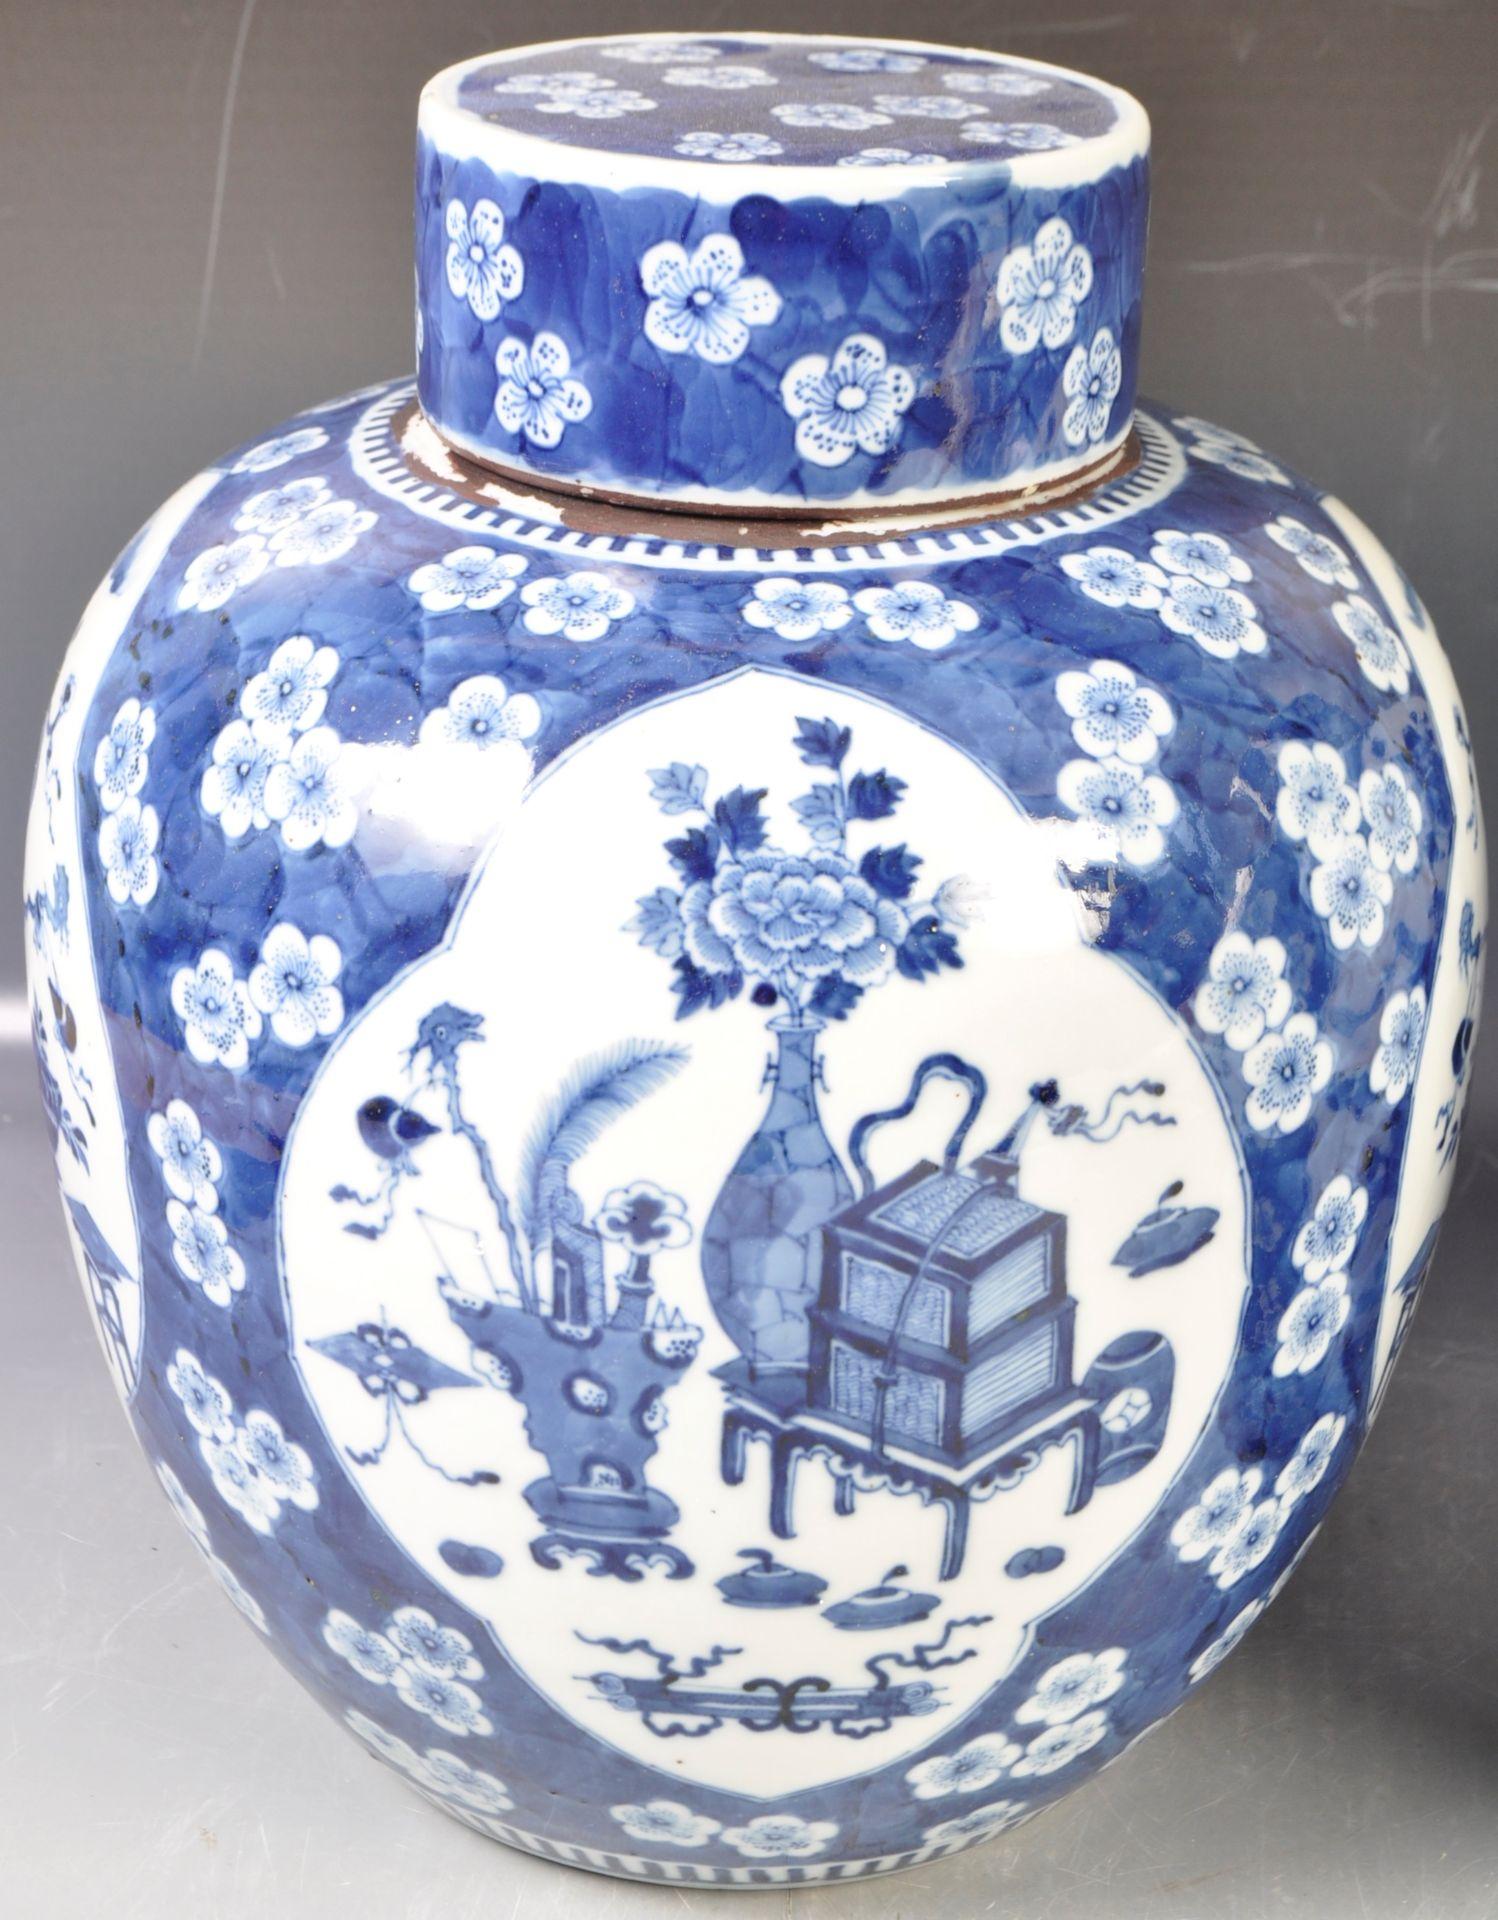 LARGE AND IMPRESSIVE PAIR OF CHINESE KANGXI MARK LIDDED JARS - Image 2 of 13